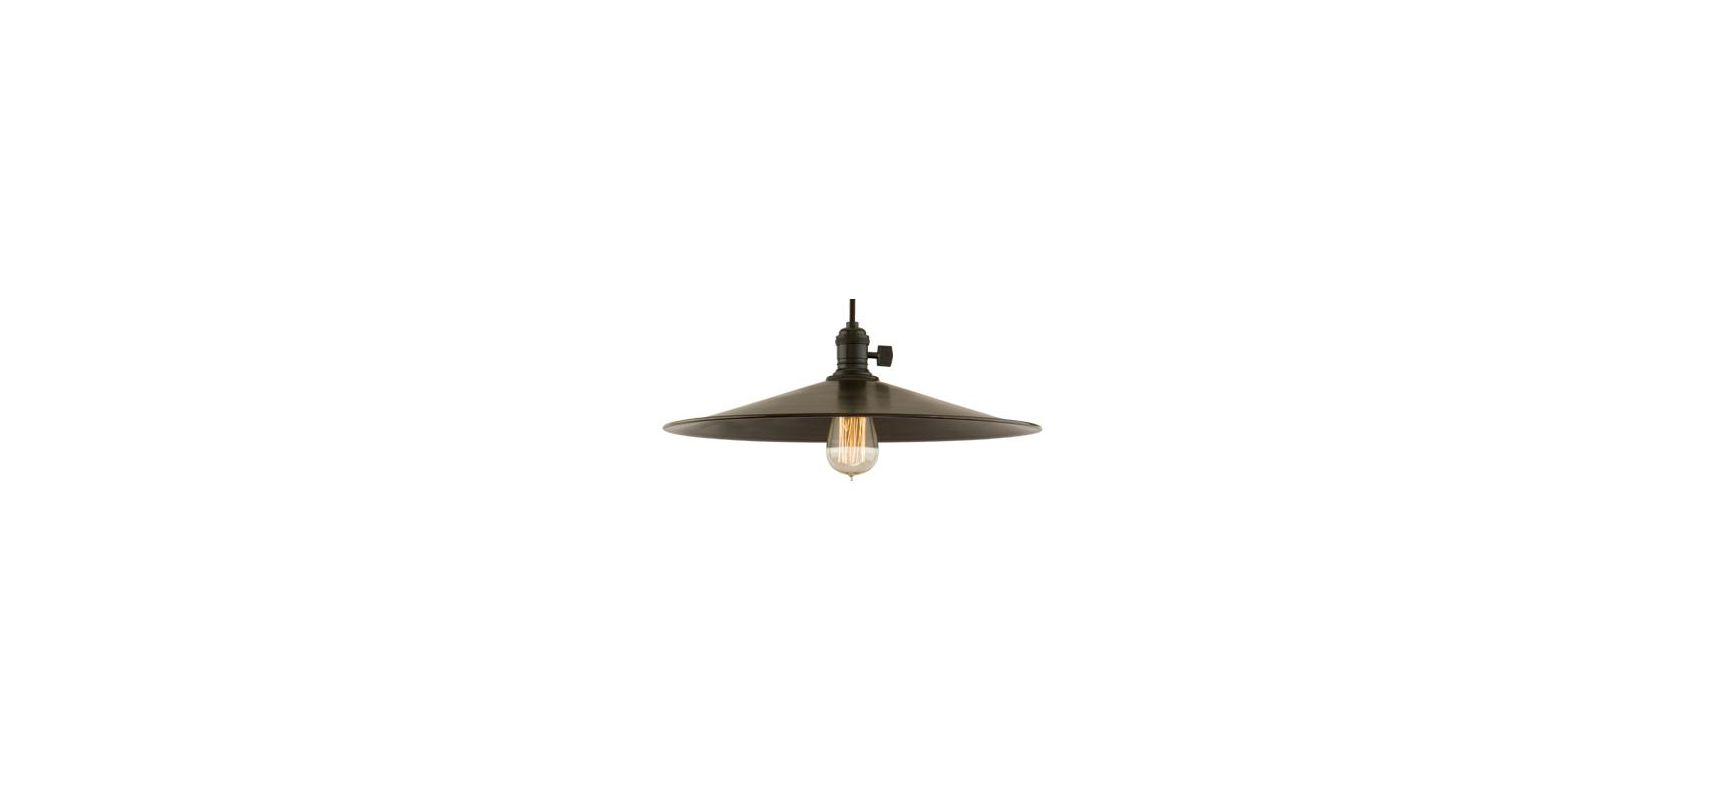 Hudson Valley 8002-OB-MM1 Bronze Industrial Heirloom Pendant